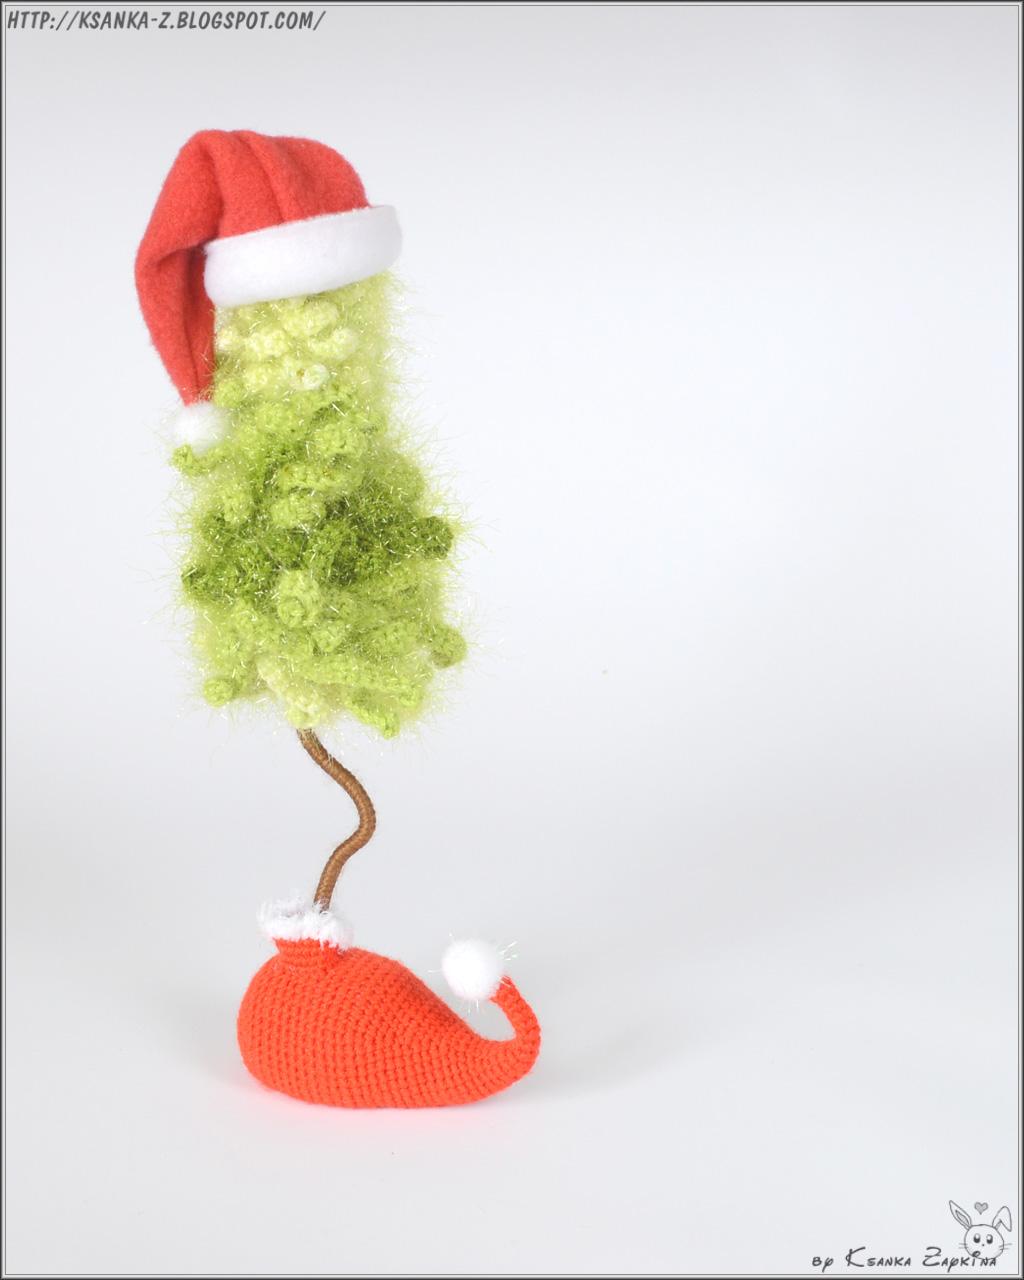 вязаная елка, елка крючком, амигуруми, игрушки ручной работы, игрушки крючком